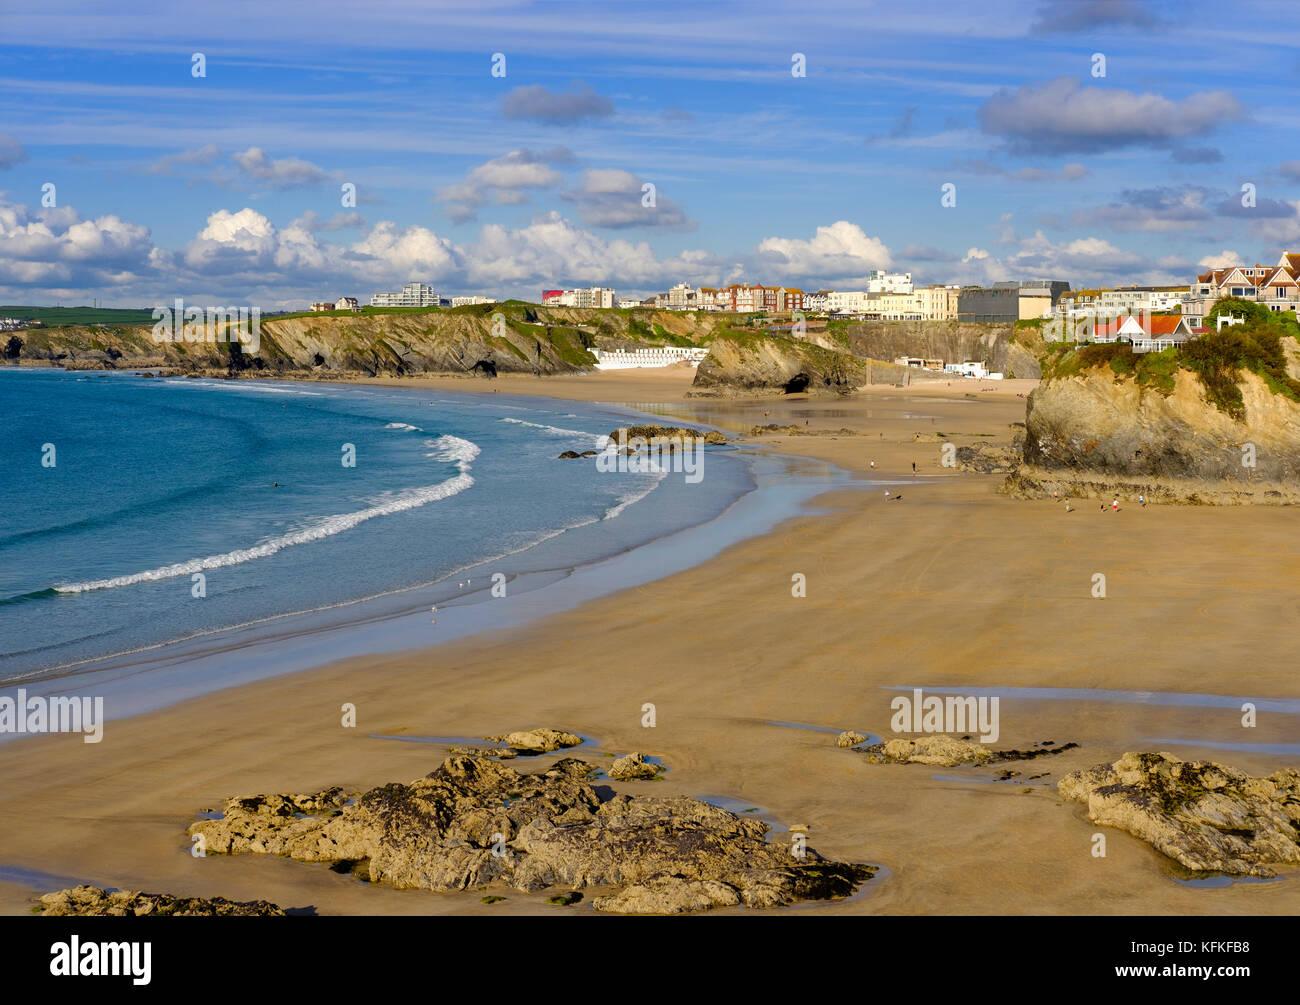 Towan Beach, Newquay, Cornwall, England, Great Britain - Stock Image